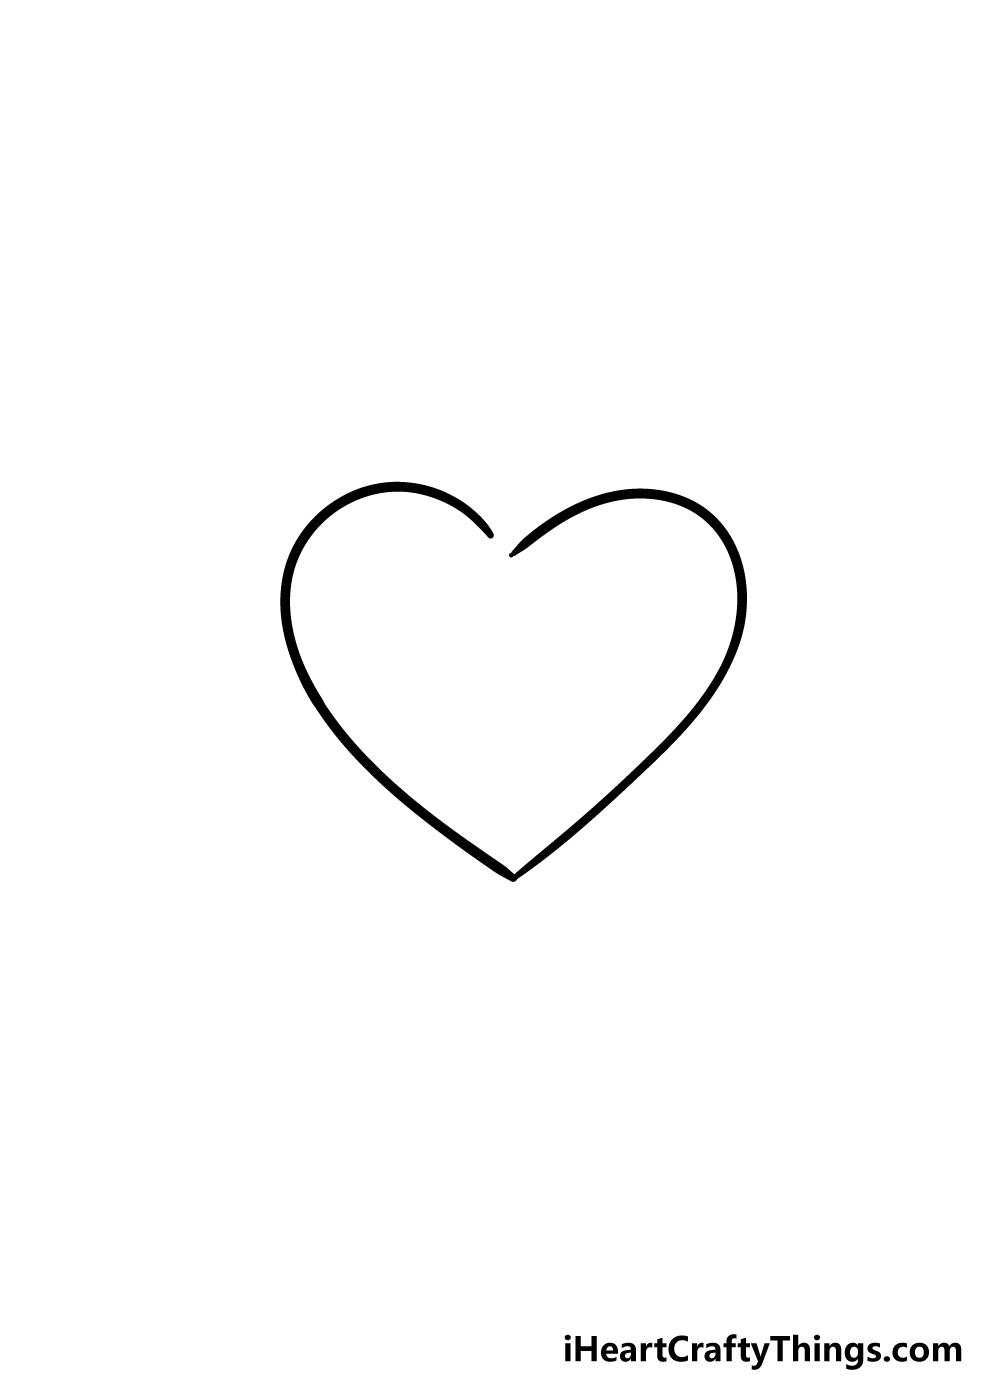 broken heart drawing step 3